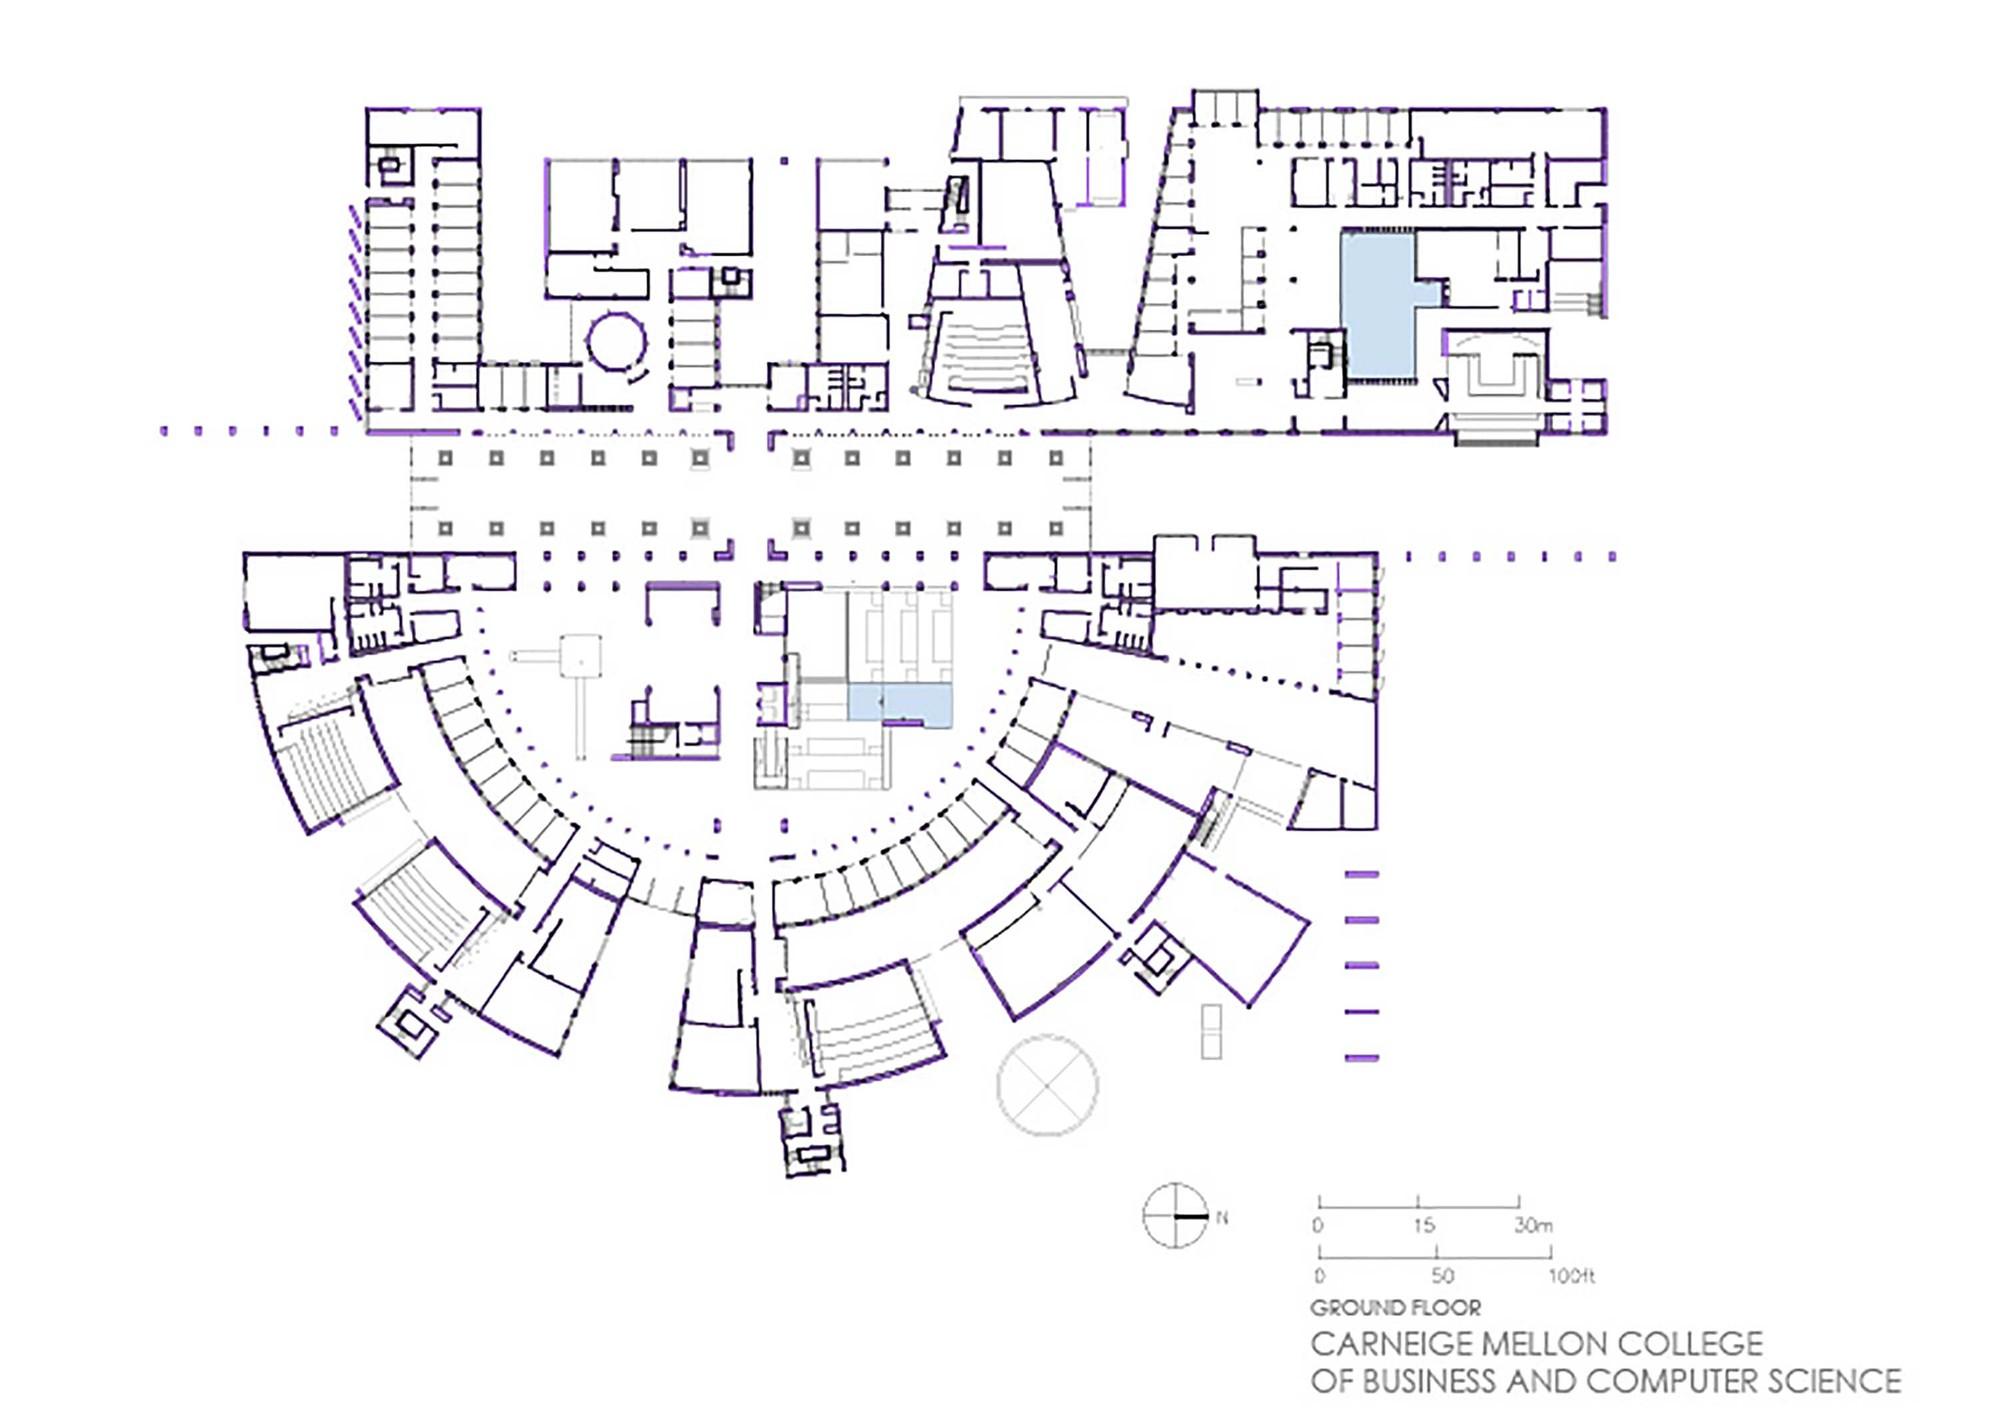 Marvelous Ground Floor Plan